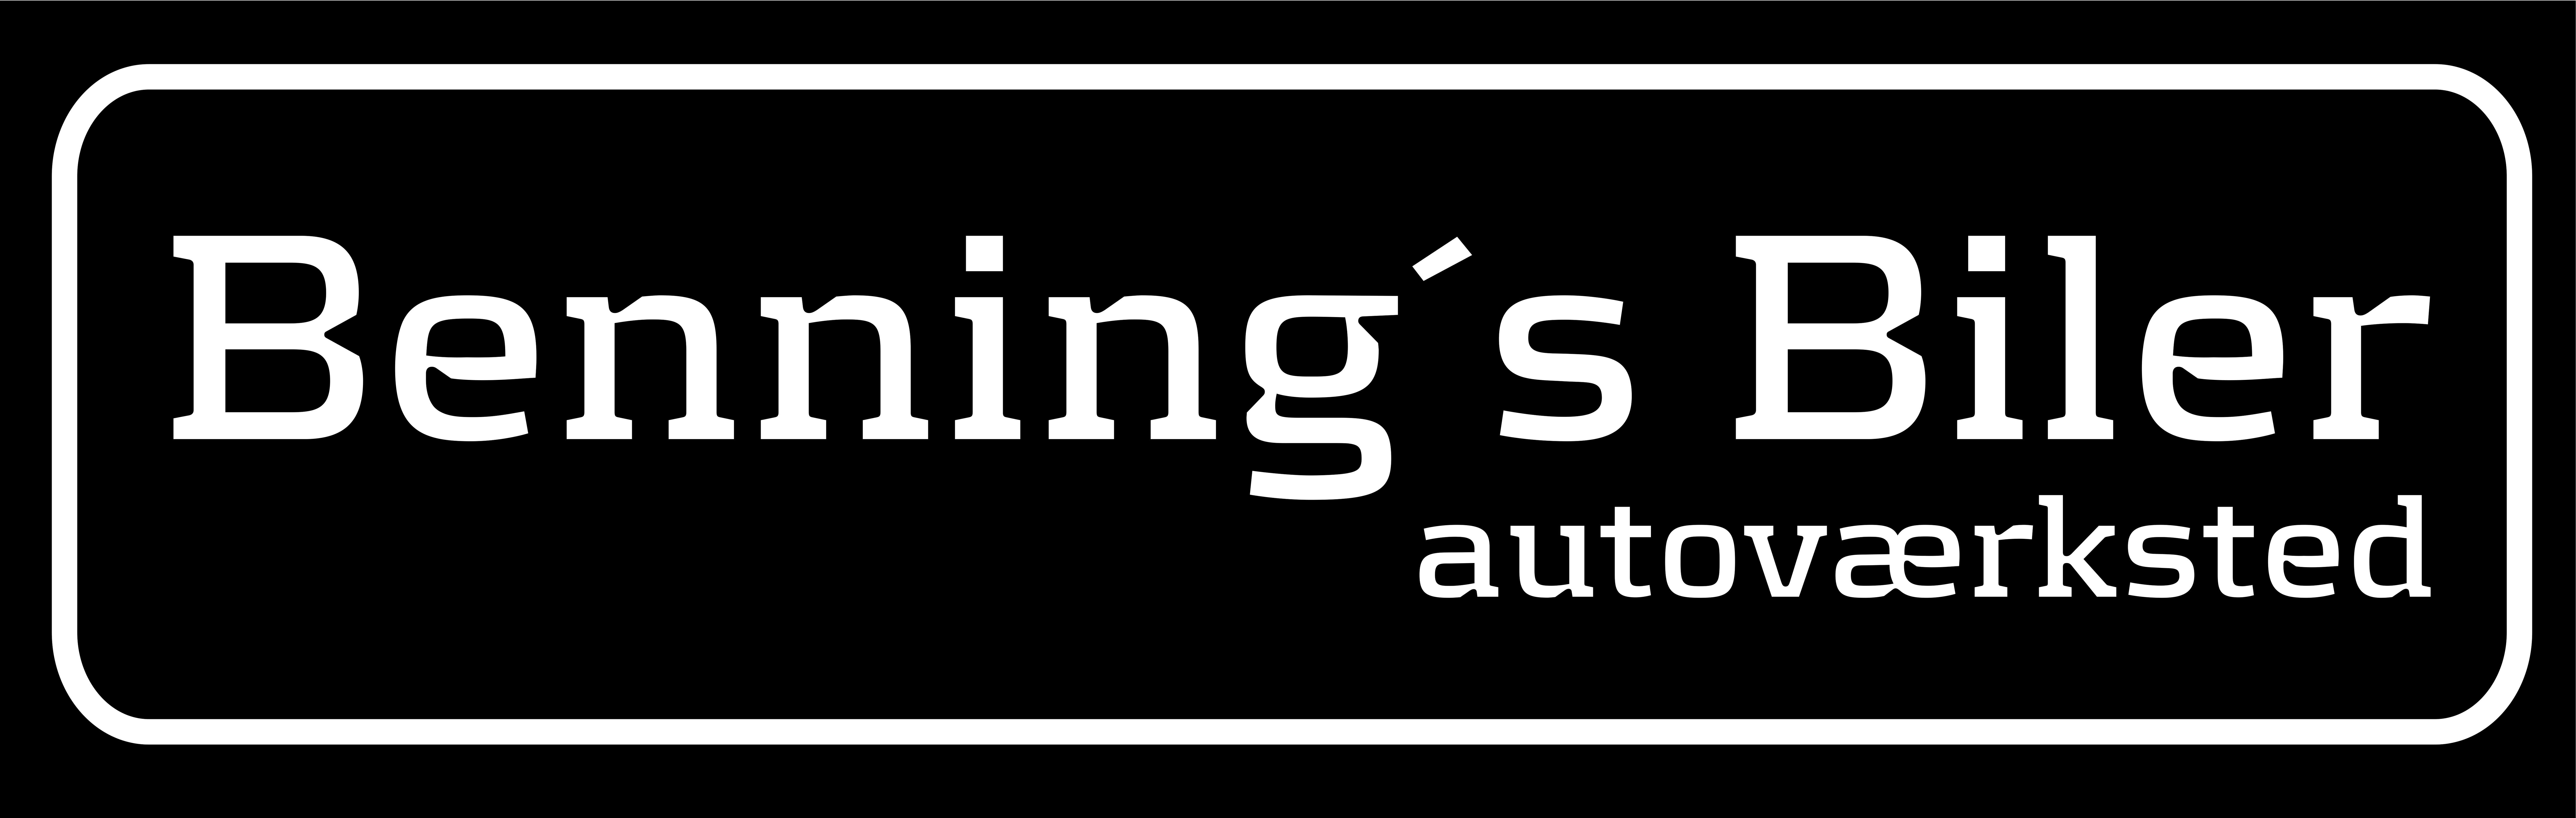 Benning's Biler, 2610 Rødovre